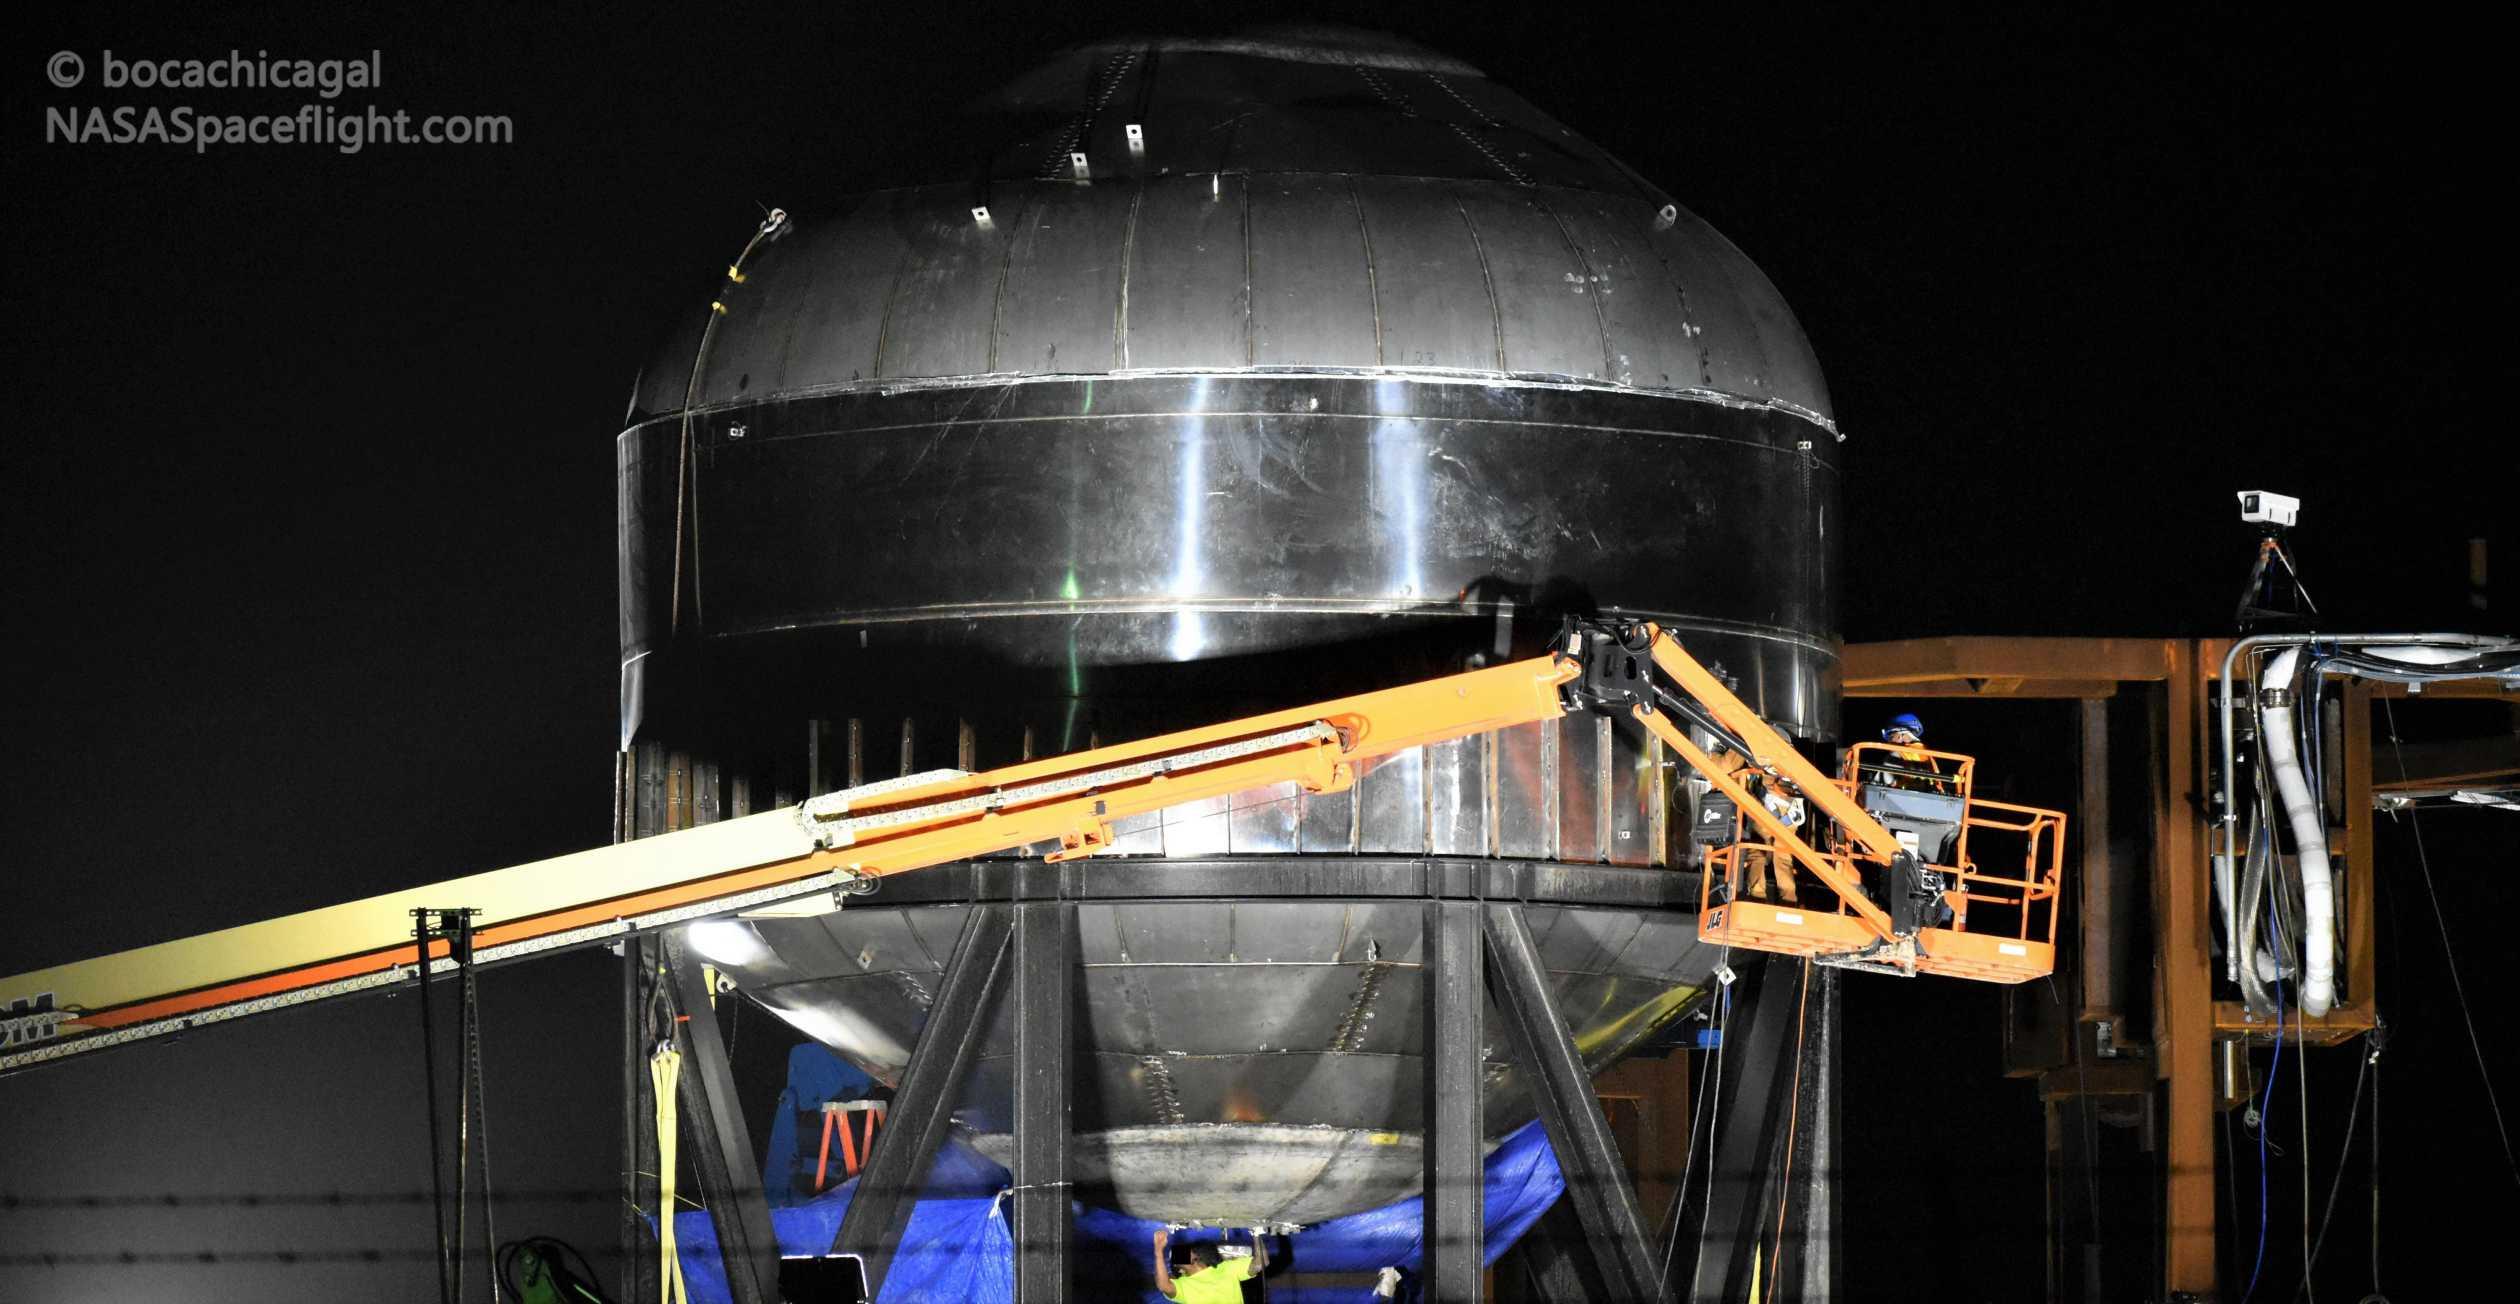 Starship Boca Chica 011020 (NASASpaceflight – bocachicagal) tesk tank prep 2 crop (c)